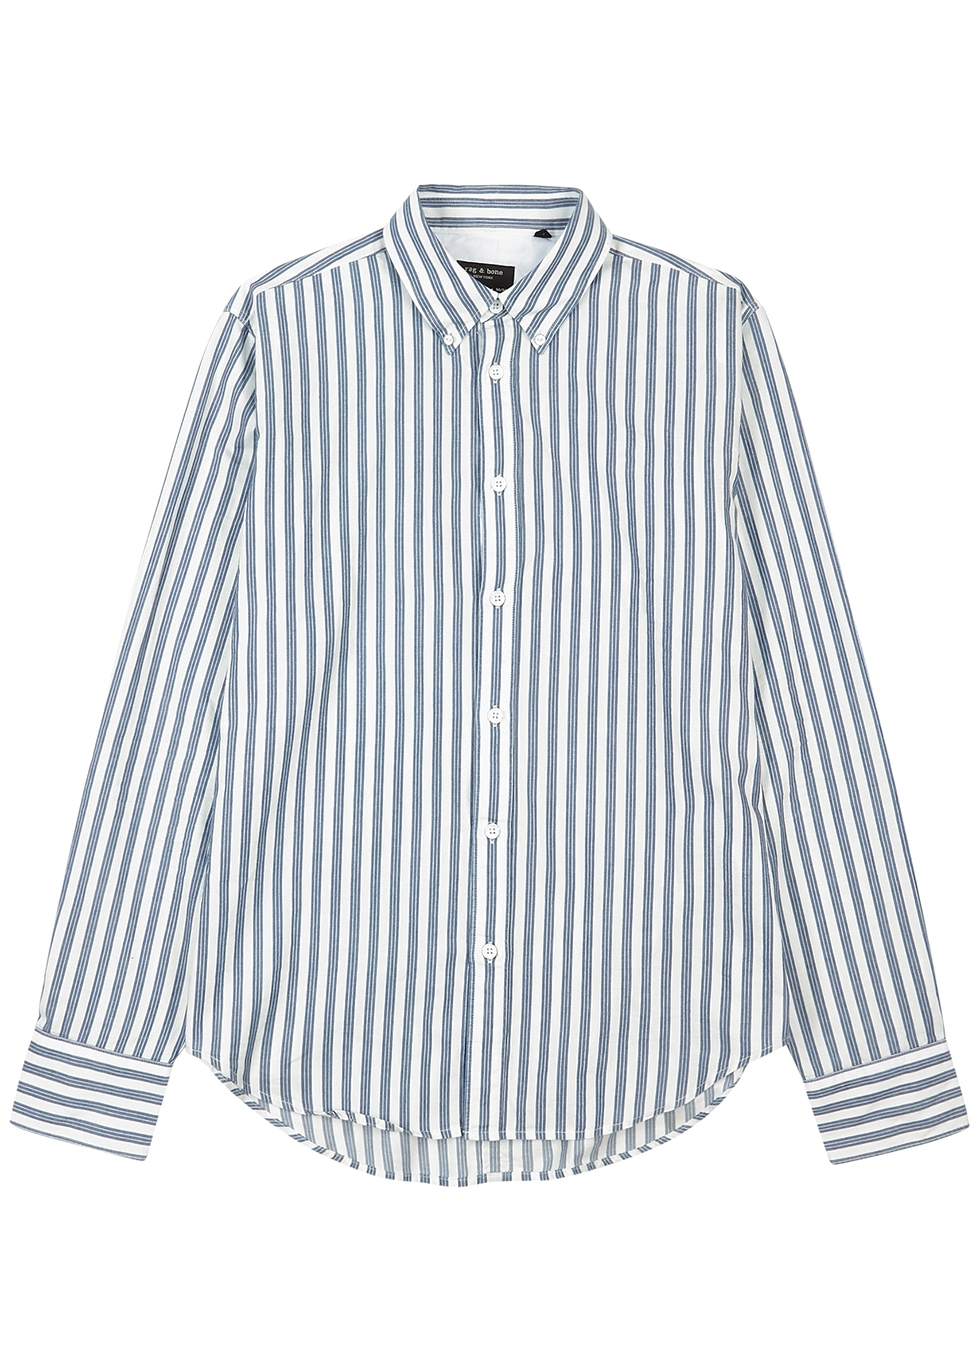 Tomlin striped cotton shirt